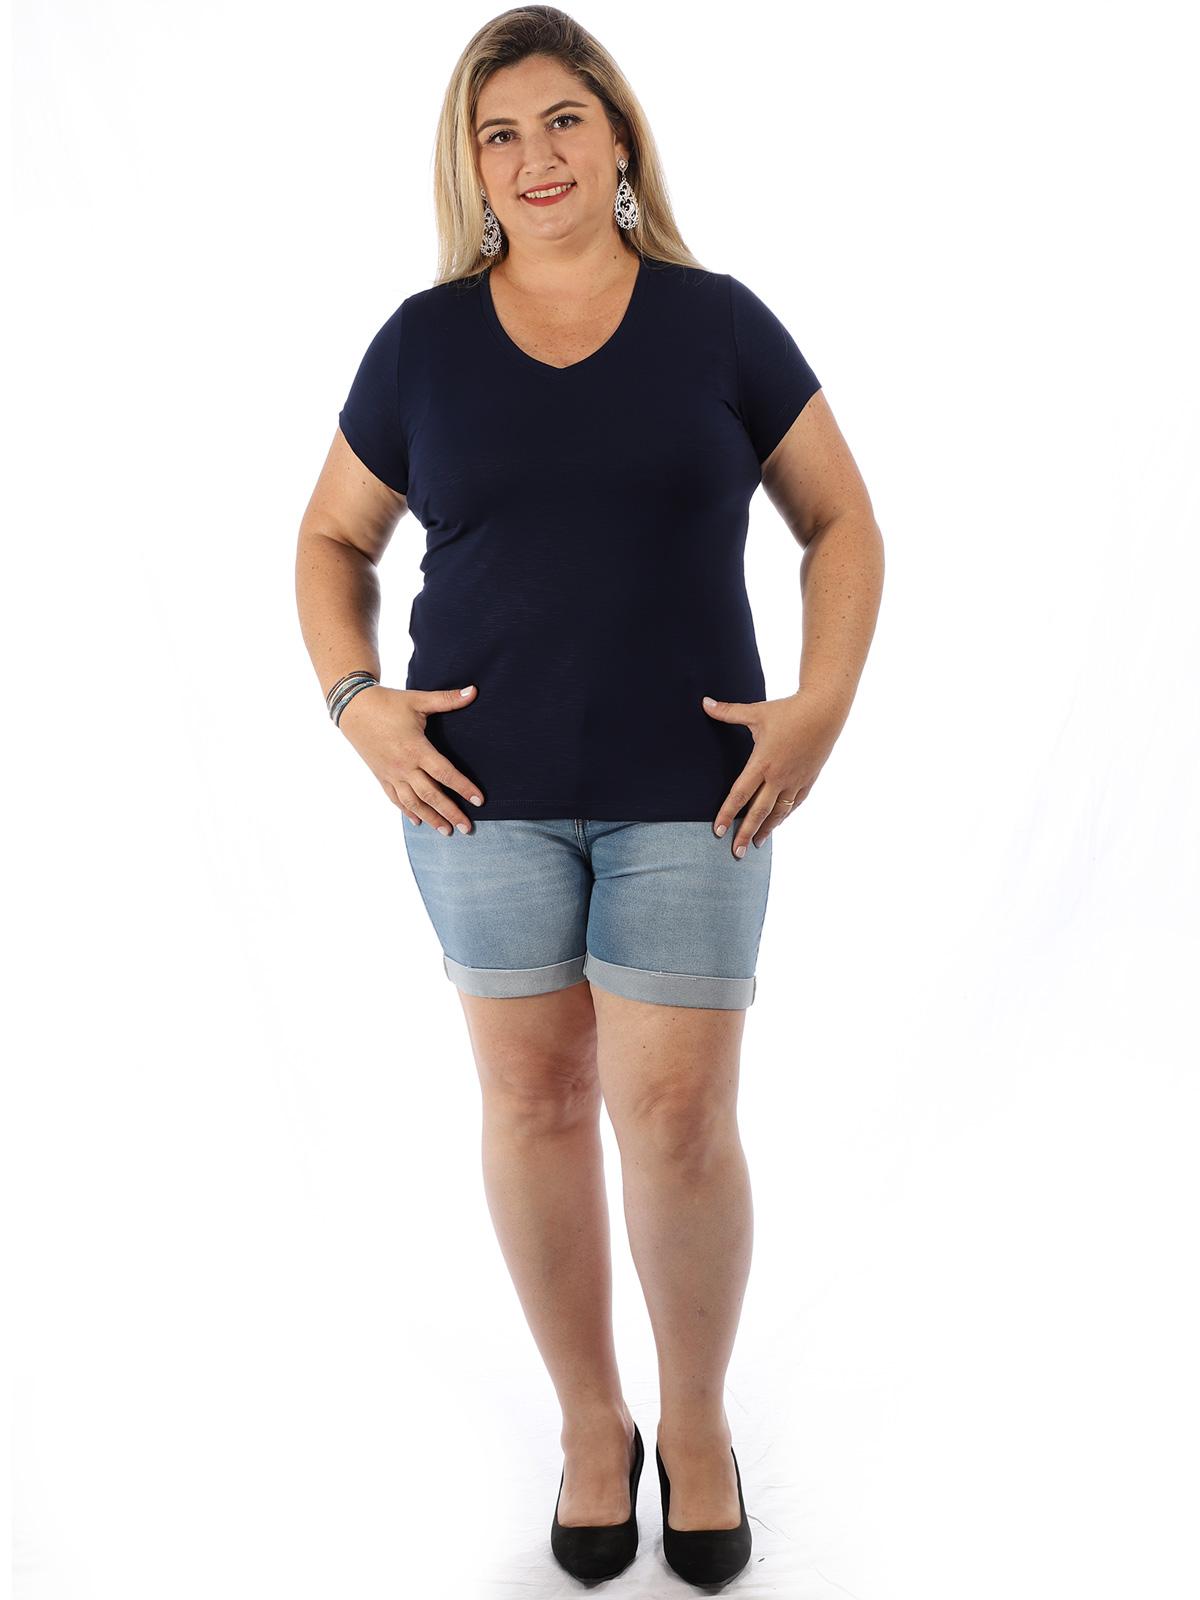 Blusa Plus Size Feminina Visco Flame Decote V. Lisa Marinho